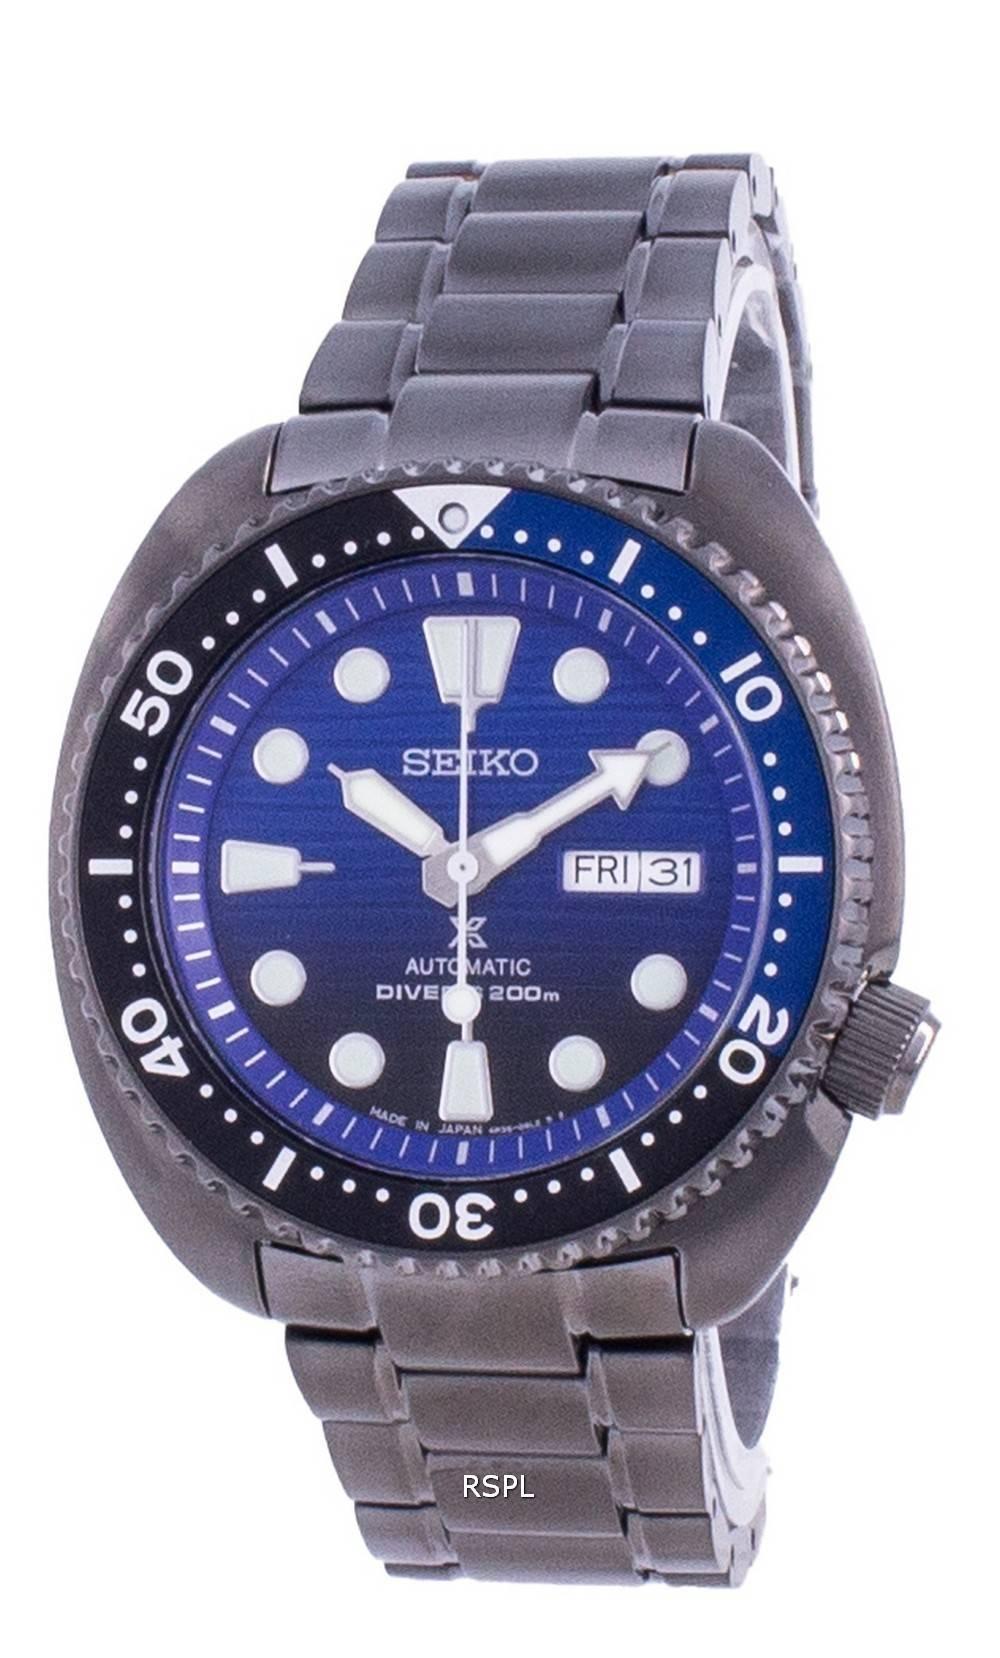 Seiko Prospex Save The Ocean Turtle Edition automaattinen SRPD11 SRPD11J1 SRPD11J 200M miesten kello